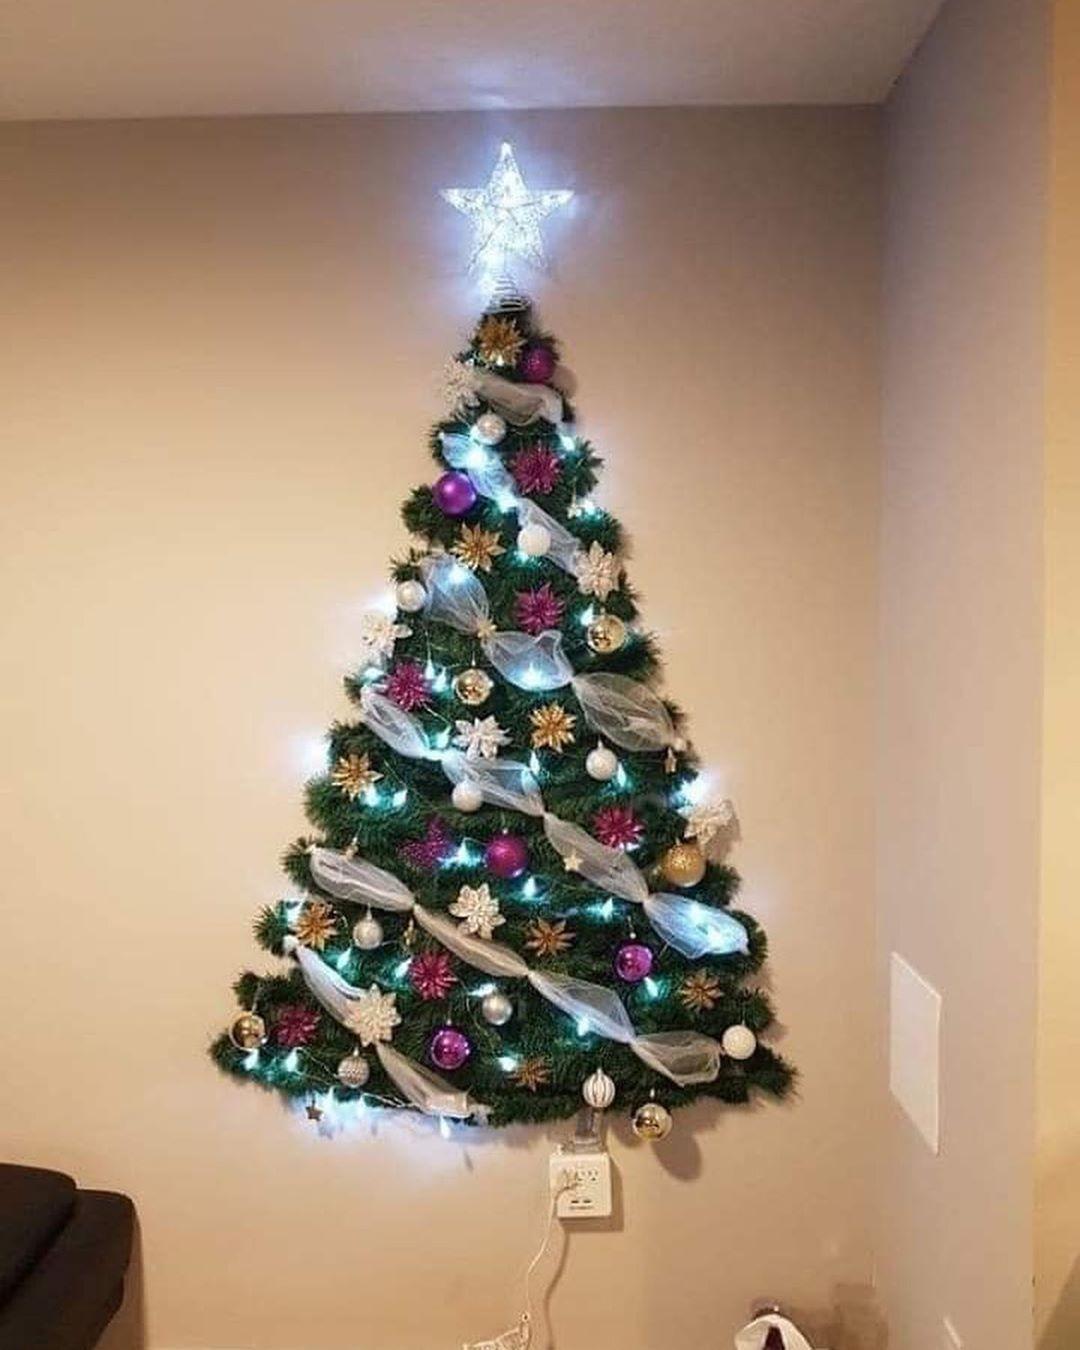 7 039 Me Gusta 145 Comentarios Creativos Soycreativos En Instagram Arbolitos Navidenos De Pa In 2020 Wall Christmas Tree Diy Christmas Tree Flat Christmas Tree